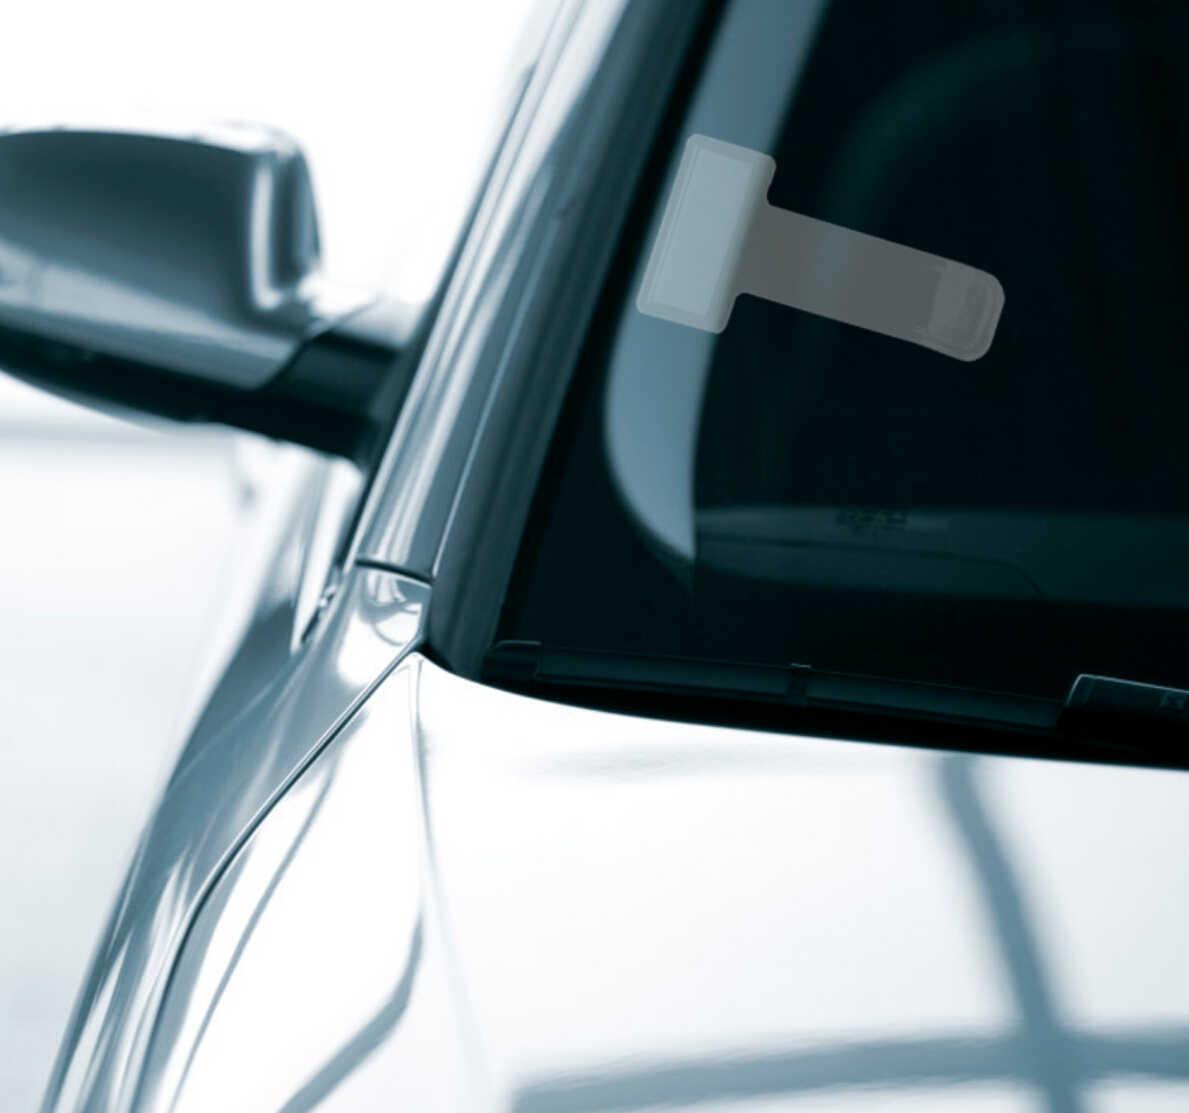 Hot New 4 pcs Auto Xe Vé Thư Mục cho Renault Megane 2 3 Duster Logan Clio 4 3 Laguna 2 sandero Scenic 2 Captur Fluence Kango